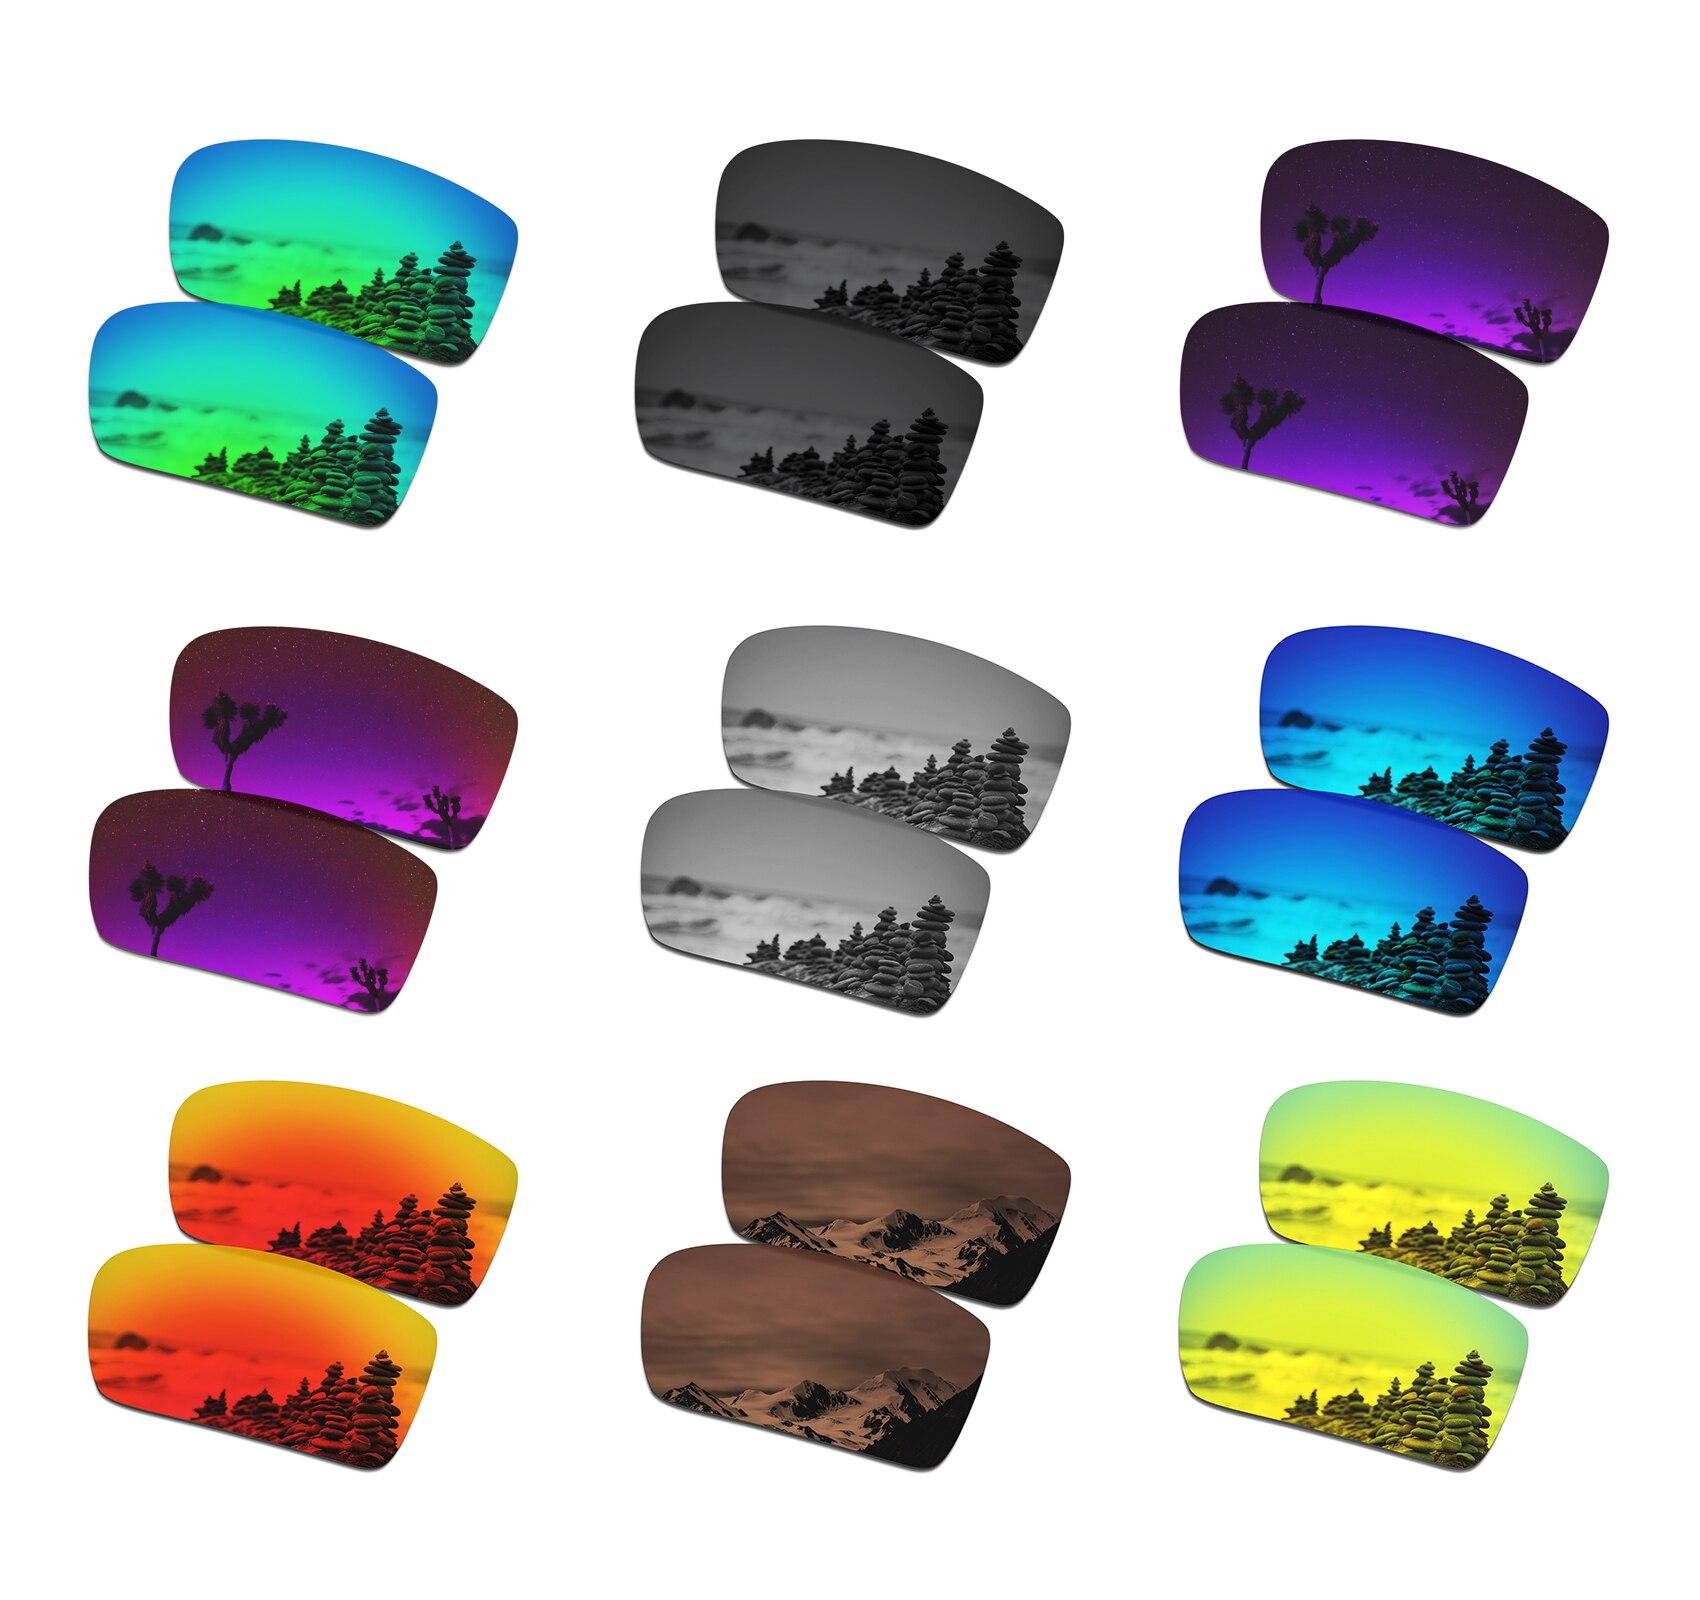 SmartVLT Polarized Replacement Lenses For Oakley Gascan Sunglasses - Multiple Options